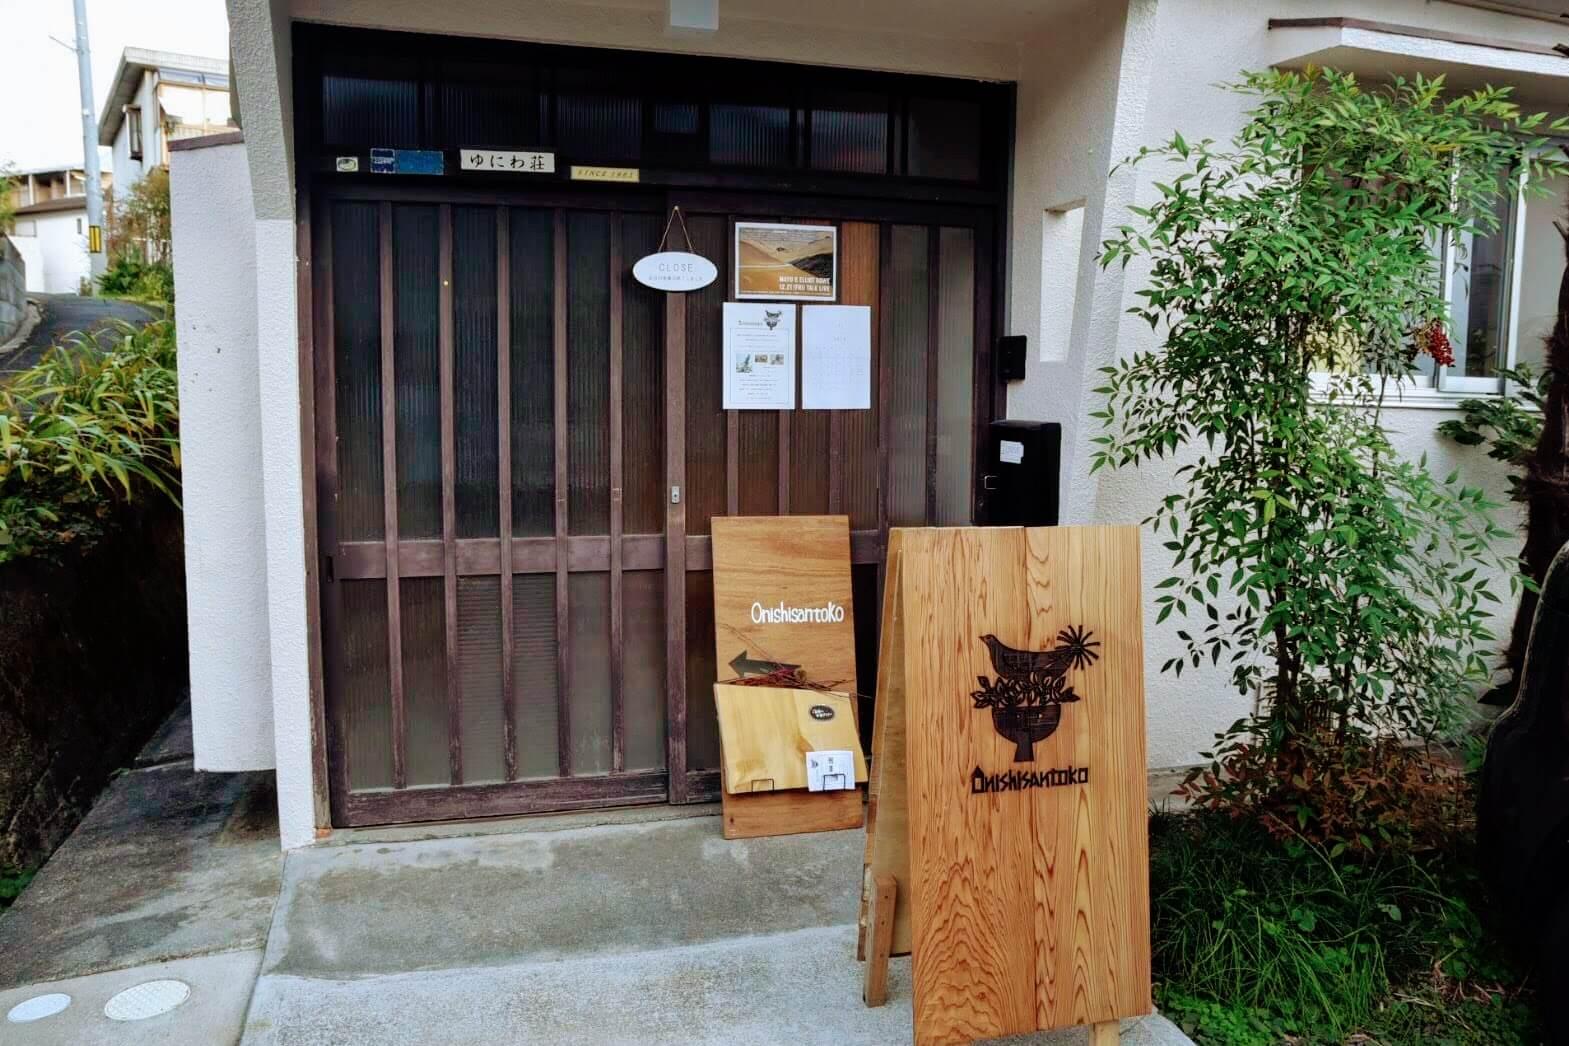 Onishisantokoの正面玄関